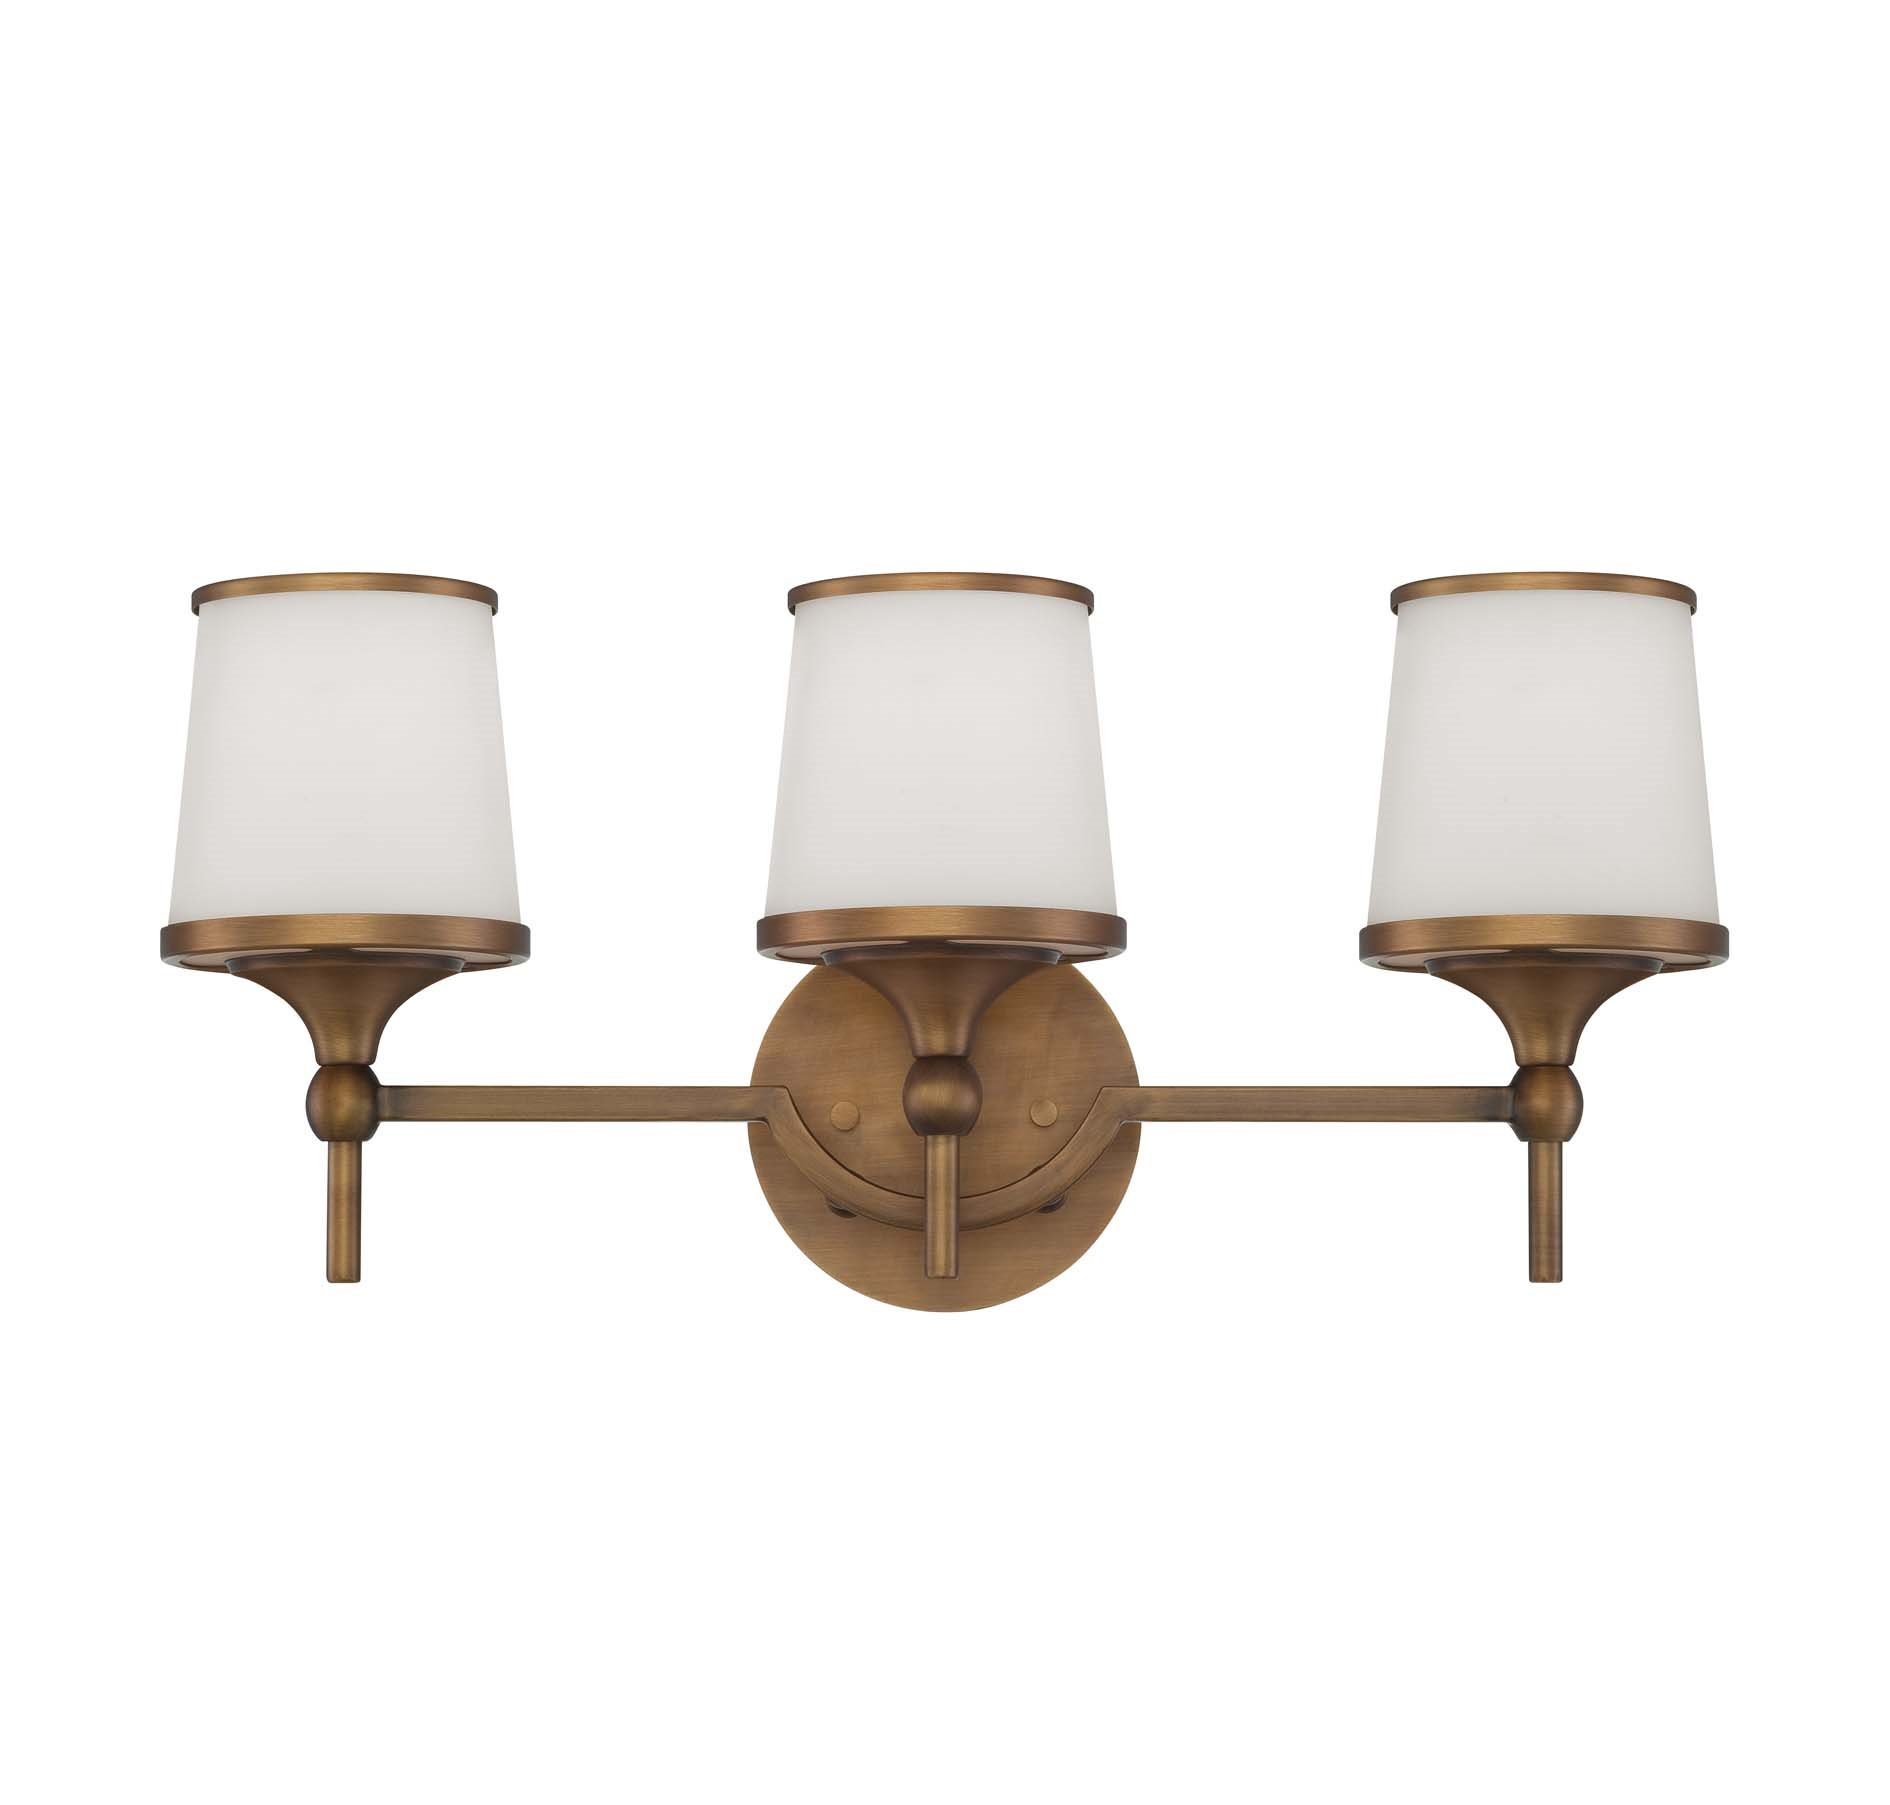 Savoy House Lighting 8 4385 3 178 Hagen Transitional